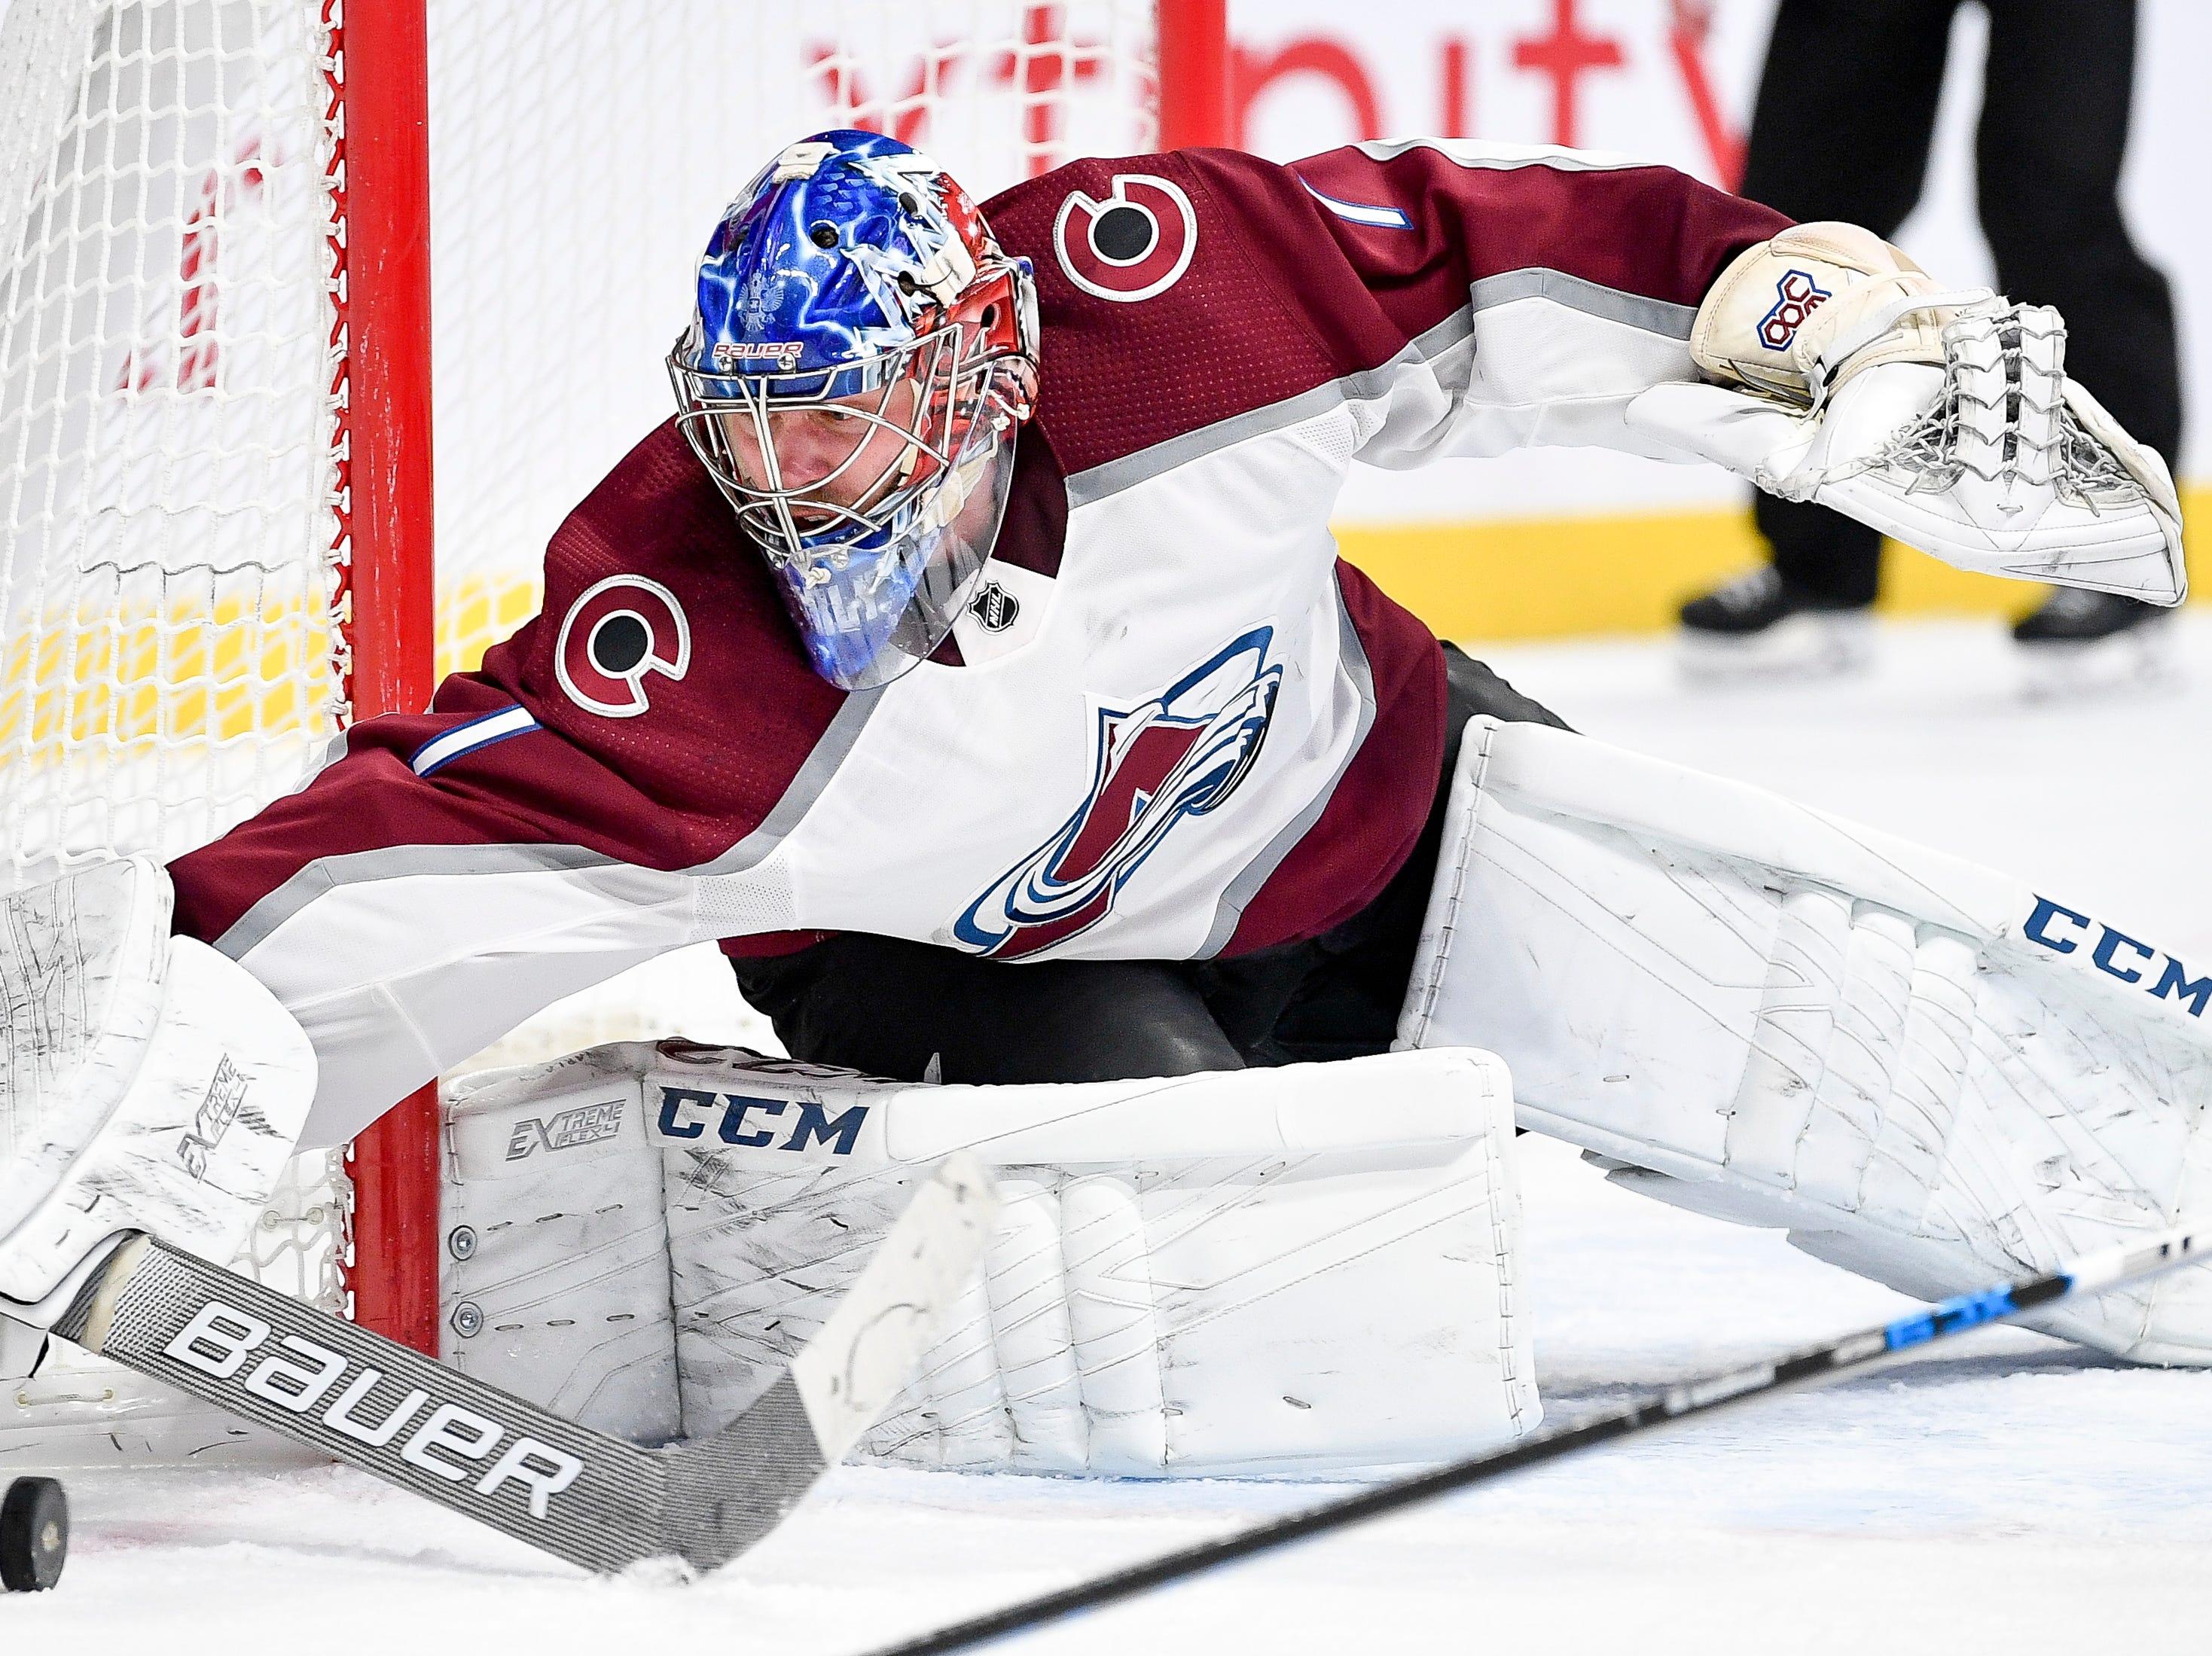 Colorado Avalanche goaltender Semyon Varlamov (1) defends against the Nashville Predators during the third period at Bridgestone Arena in Nashville, Tenn., Tuesday, Nov. 27, 2018.